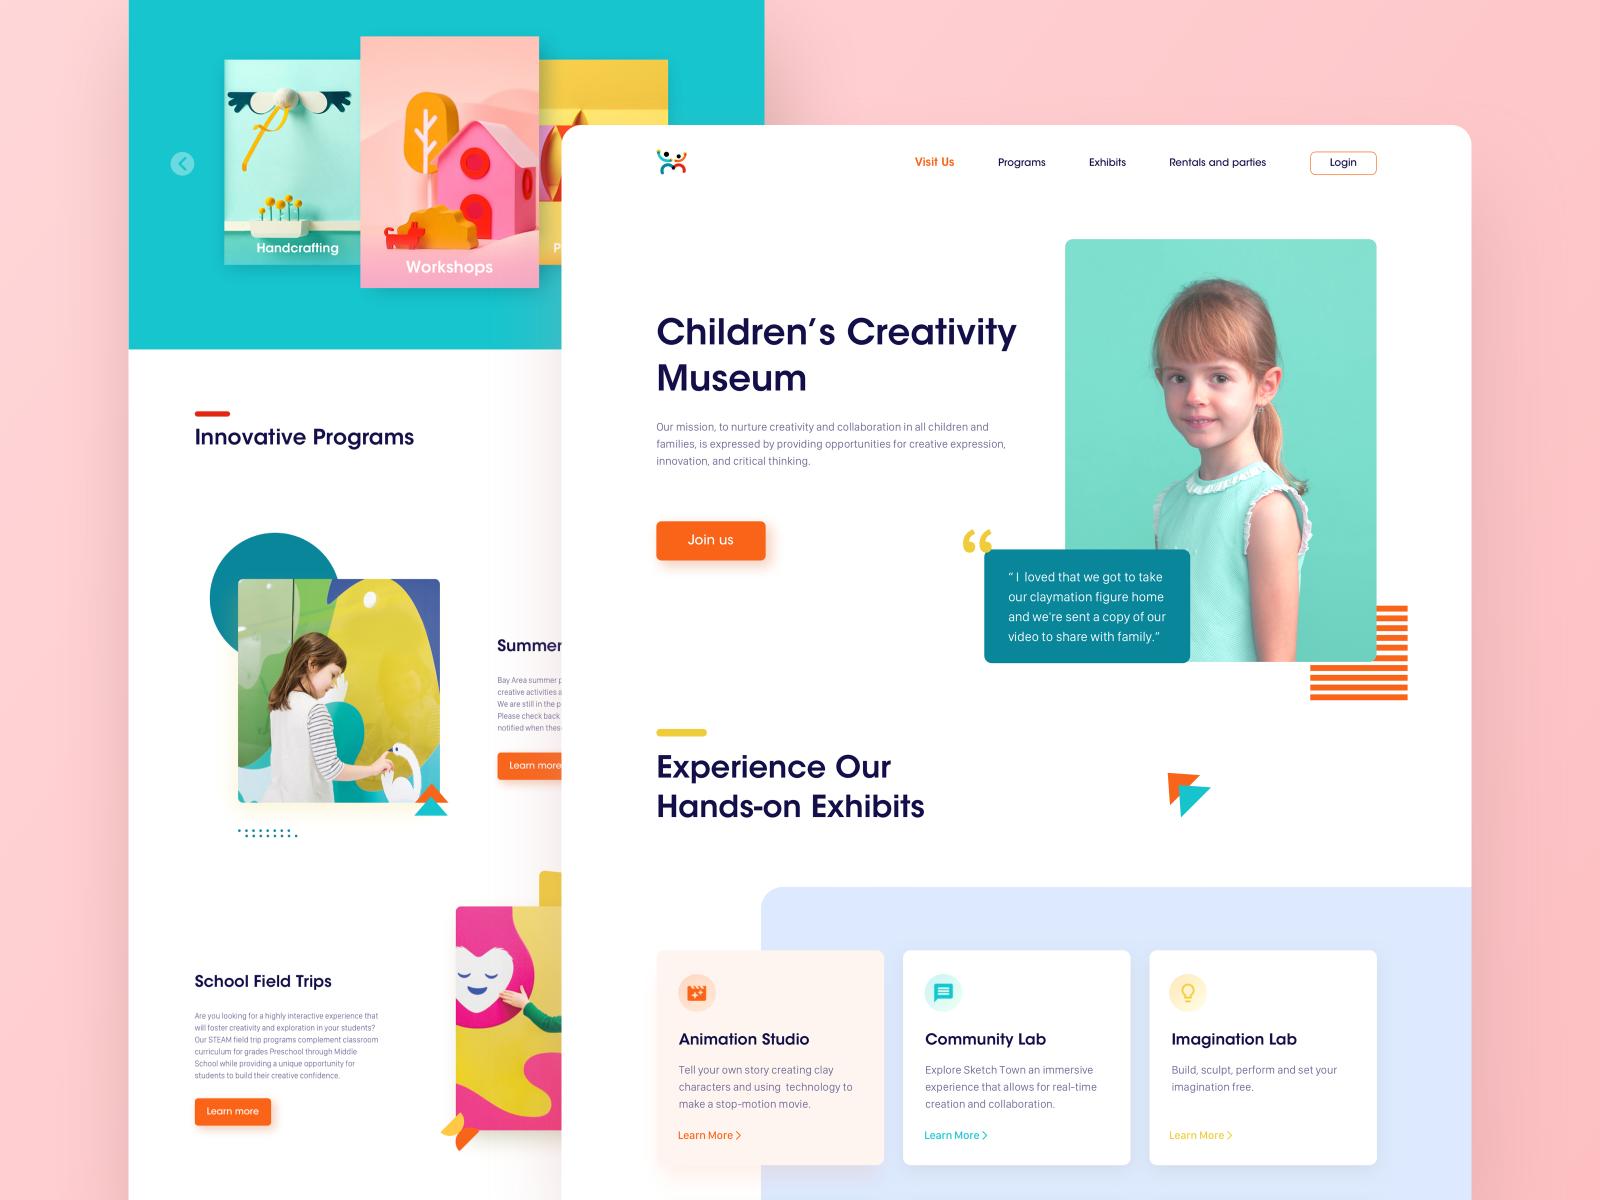 Children S Creativity Museum Homepage By Shirley Zhang For Radesign On Dribbble